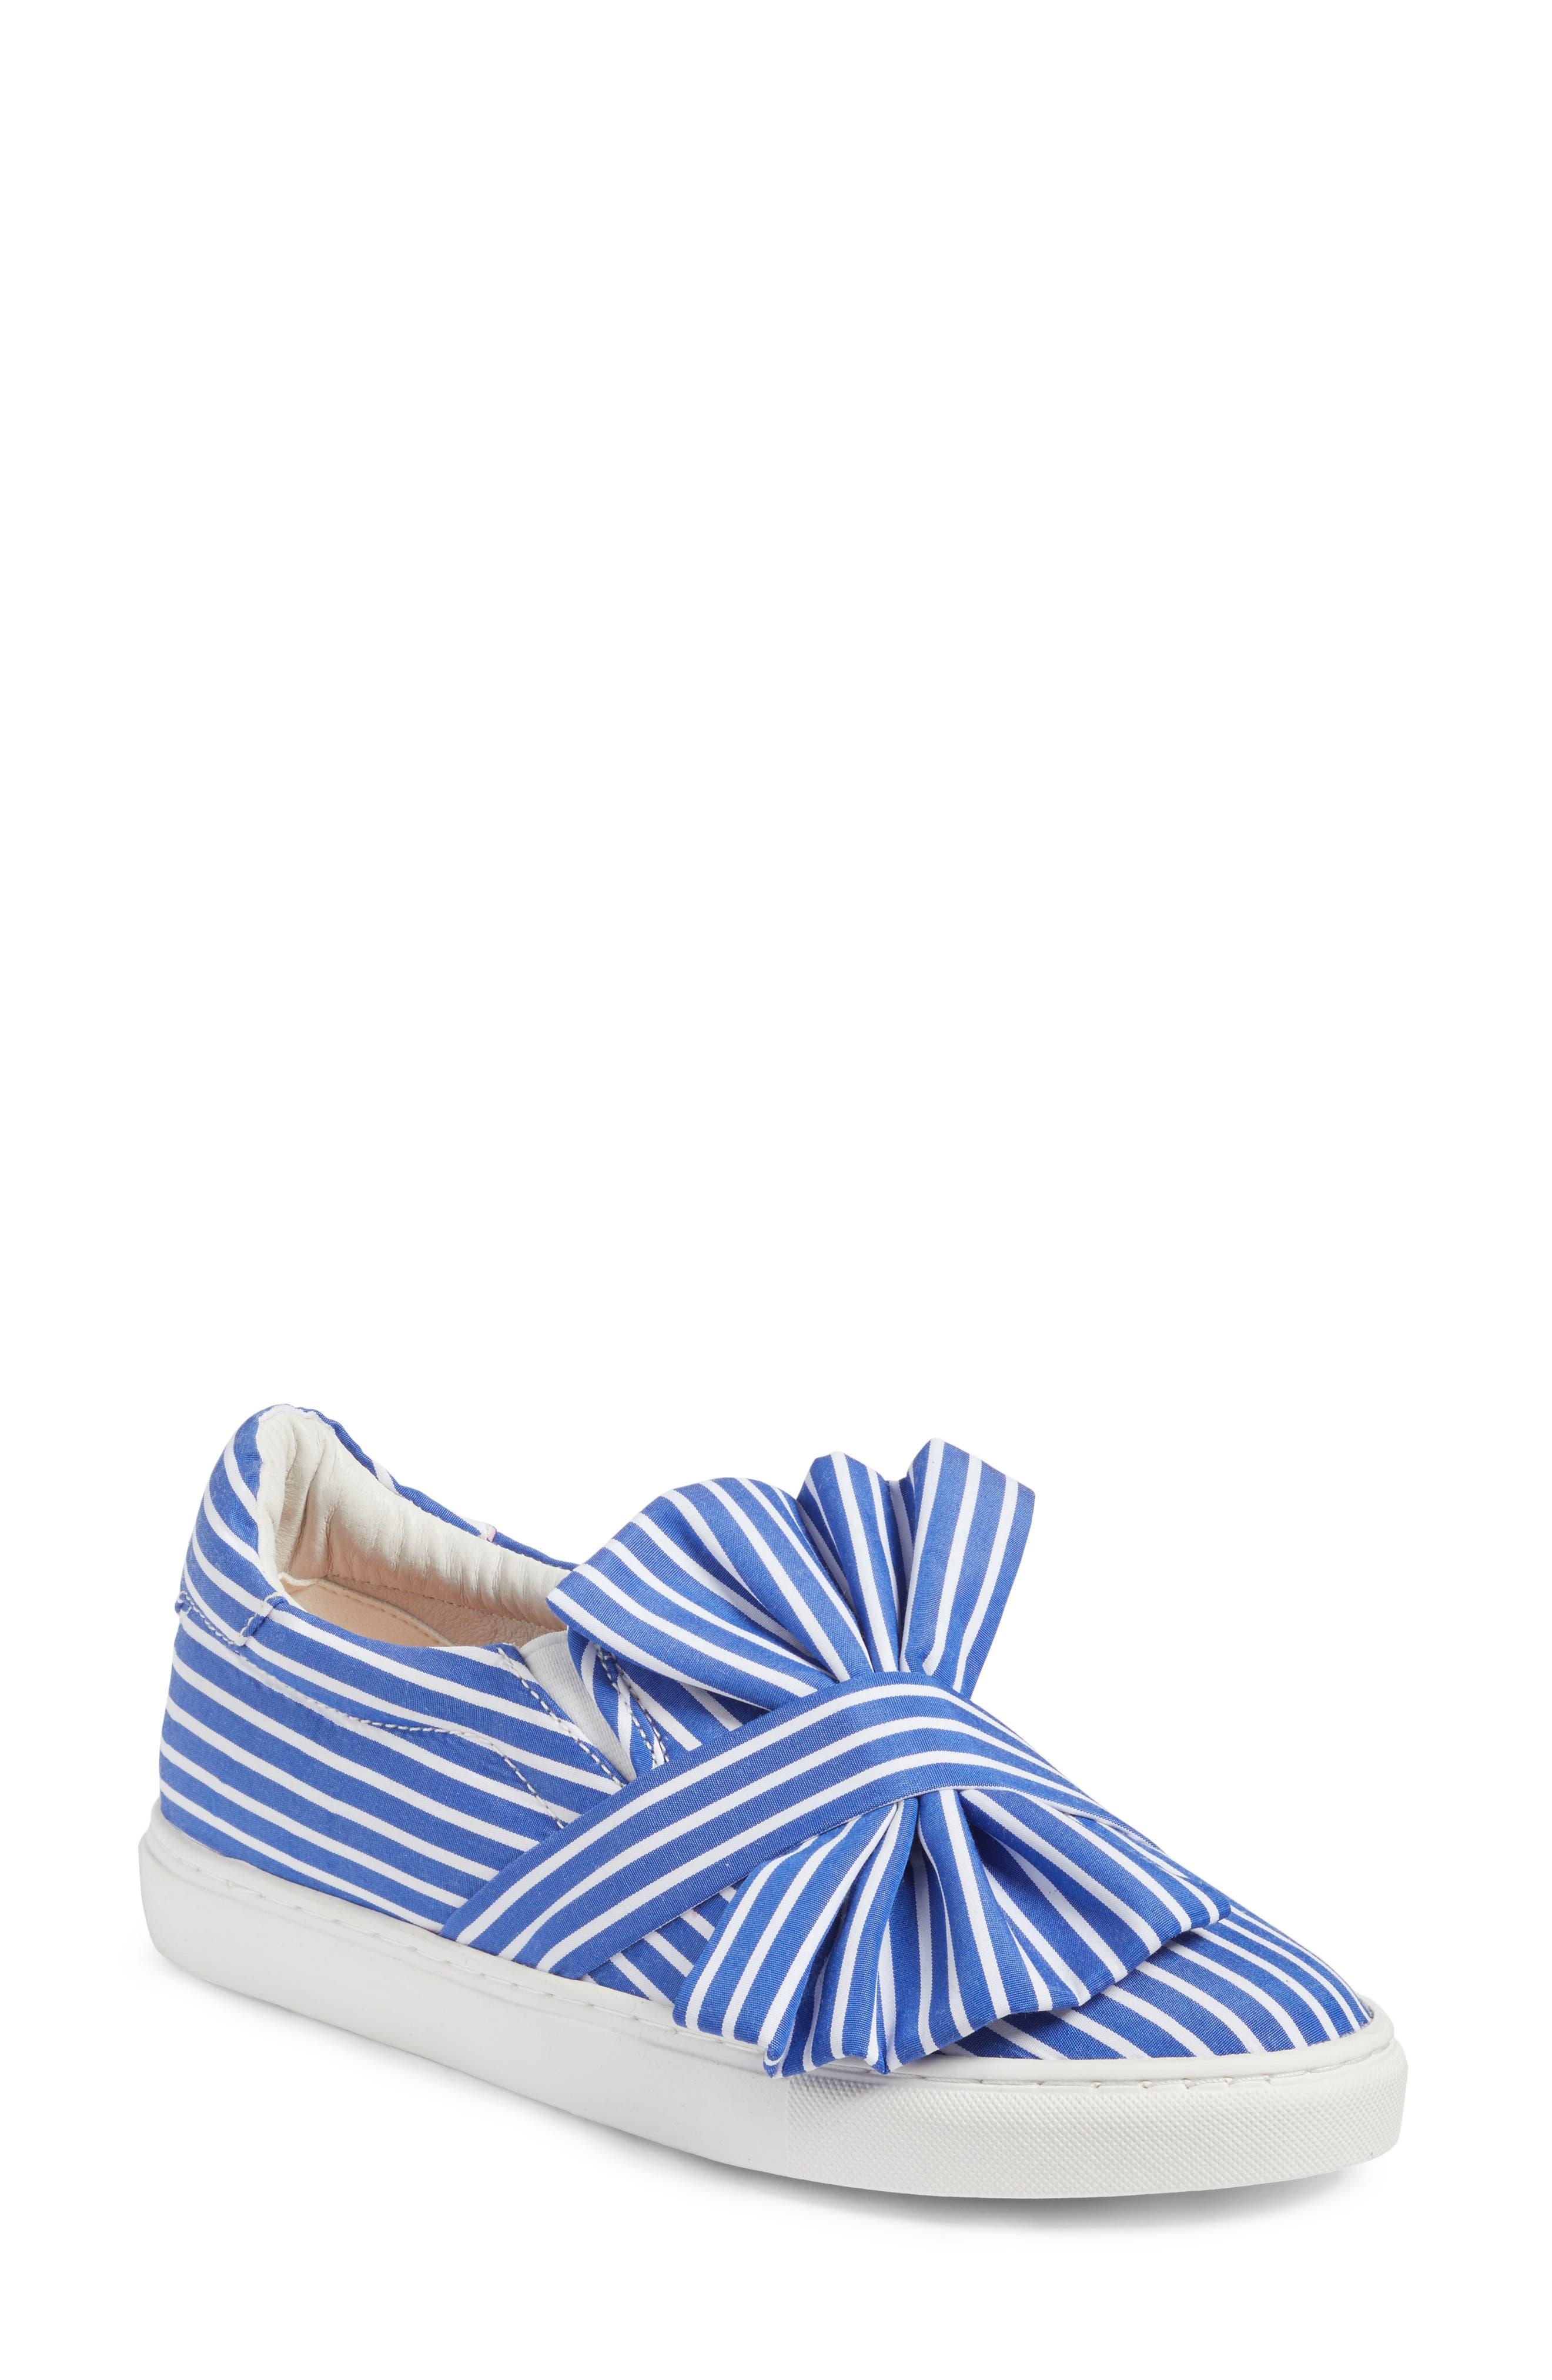 Mika Slip-On Sneaker,                             Main thumbnail 1, color,                             Blue Shirting Fabric